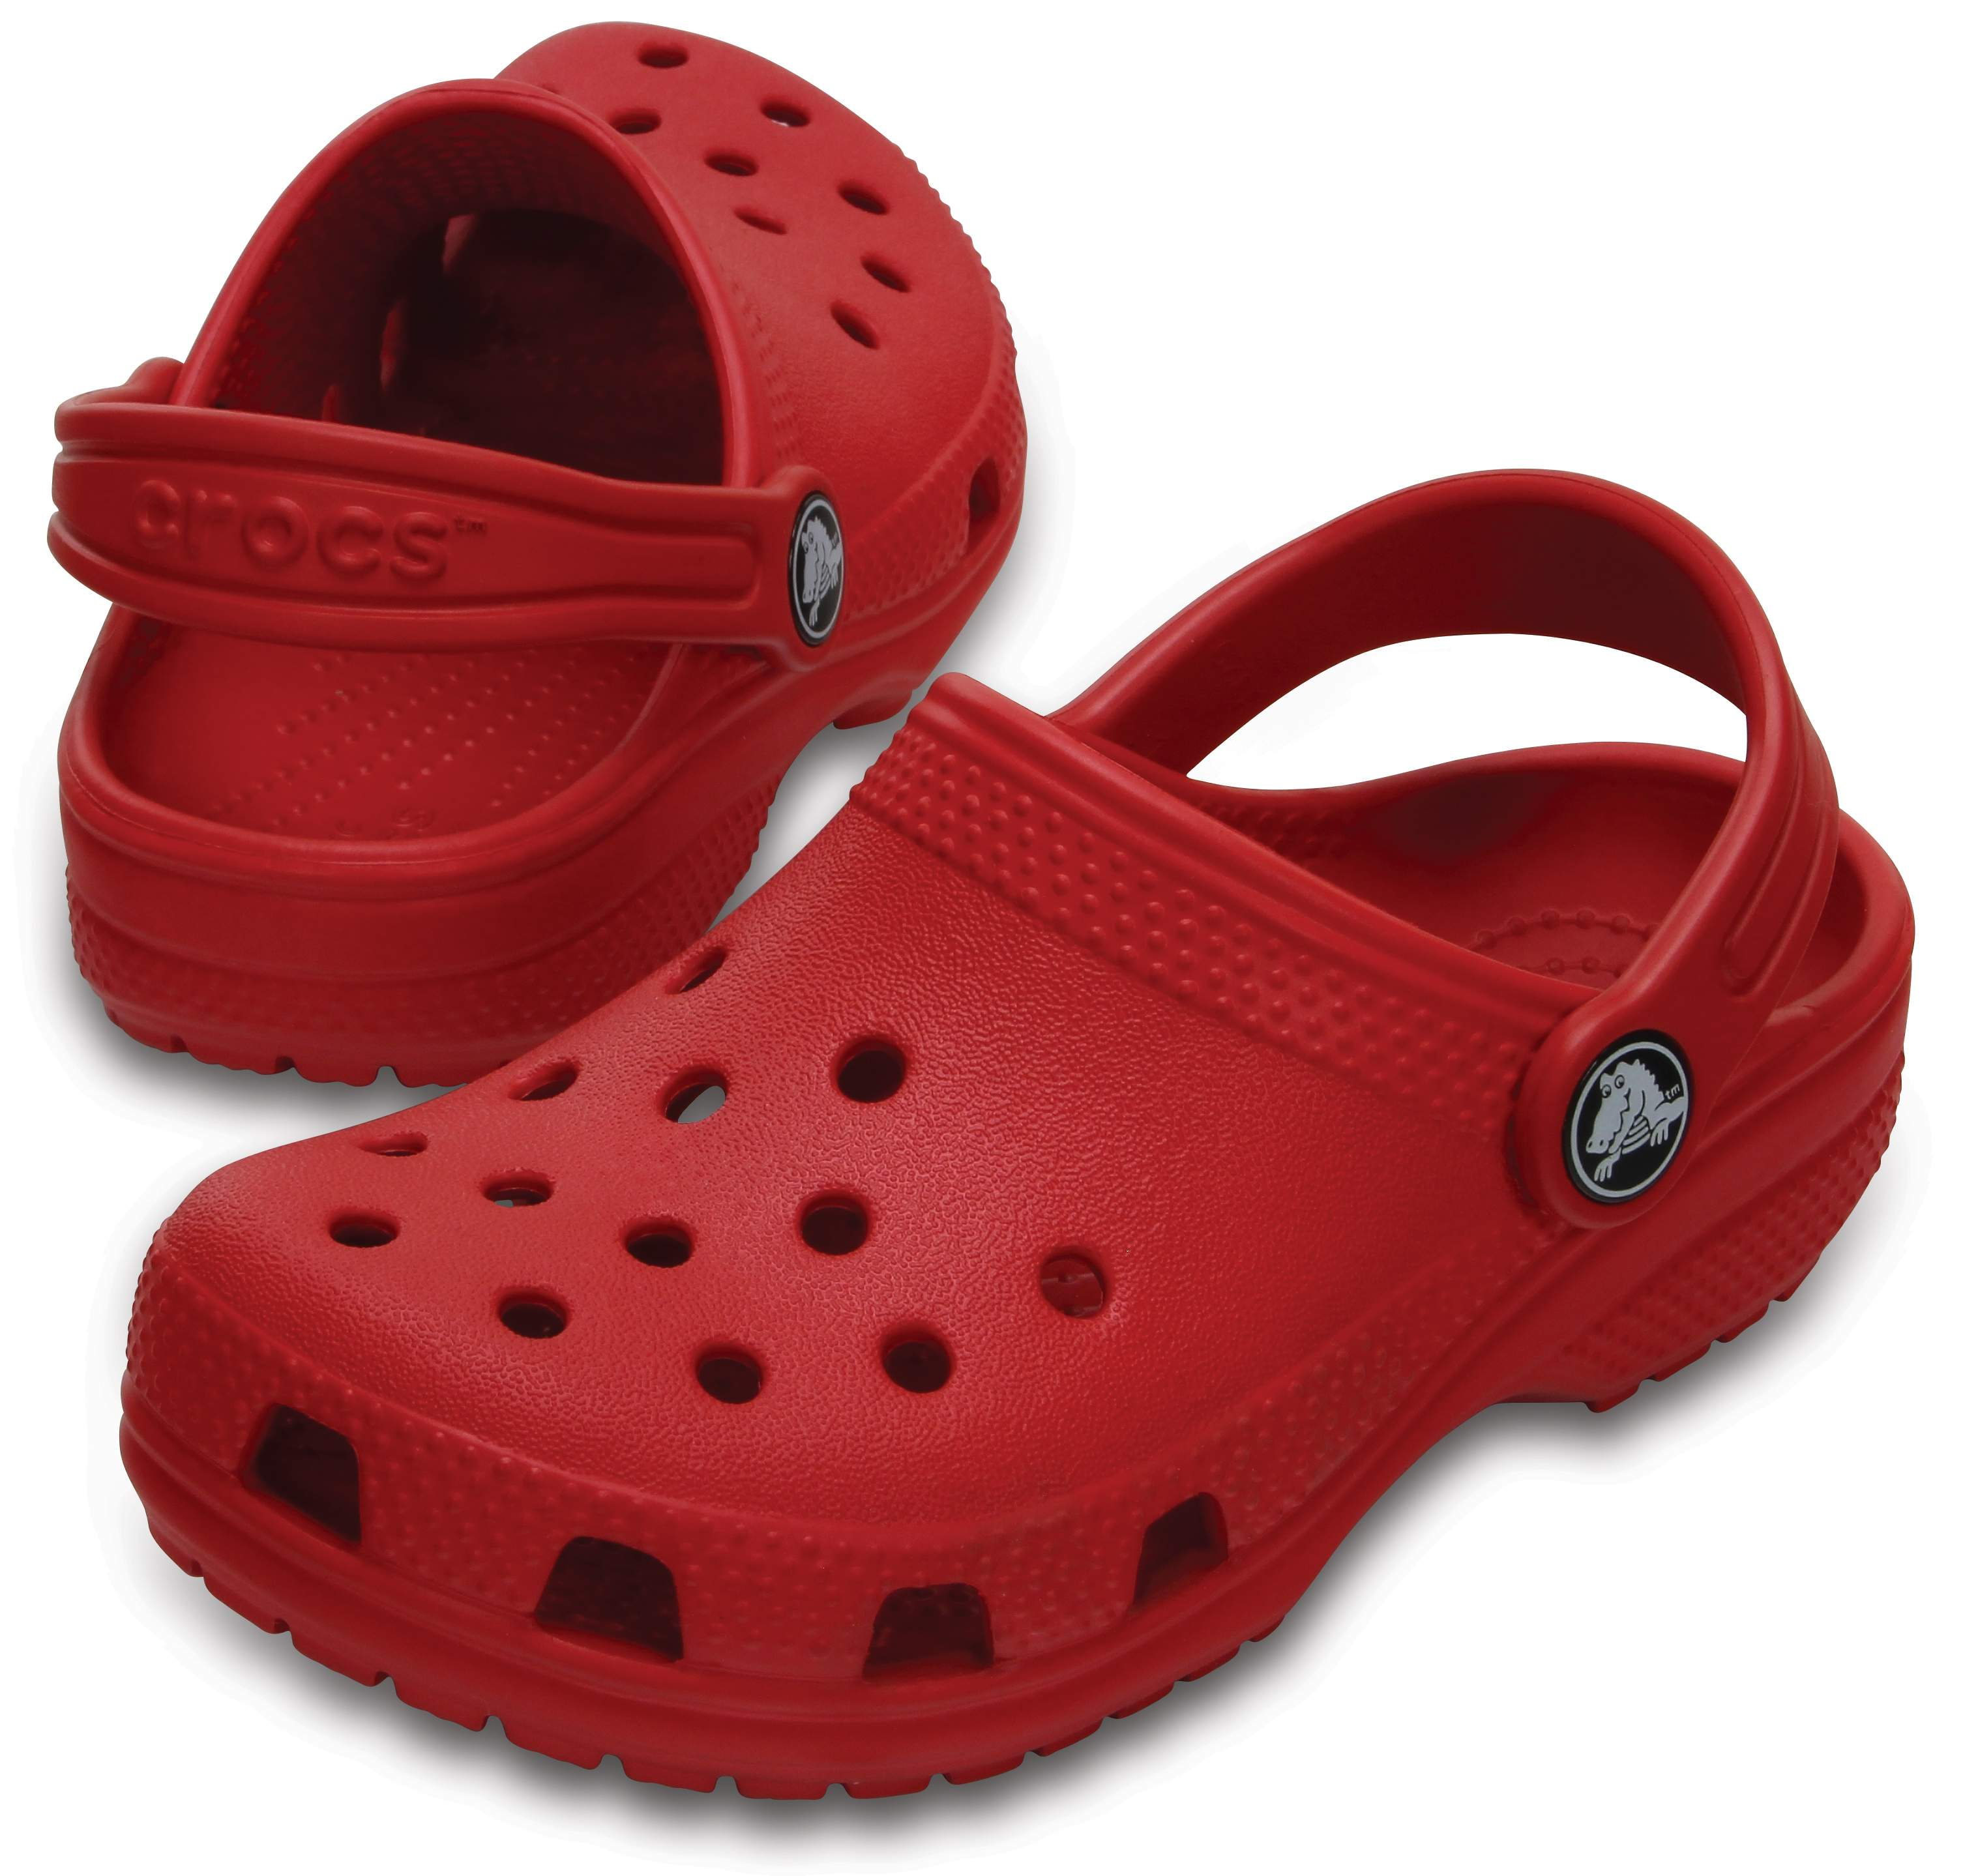 Genuine Crocs Kids//Adults Classic Caymen Clogs Amethyst 100/% Positive Reviews